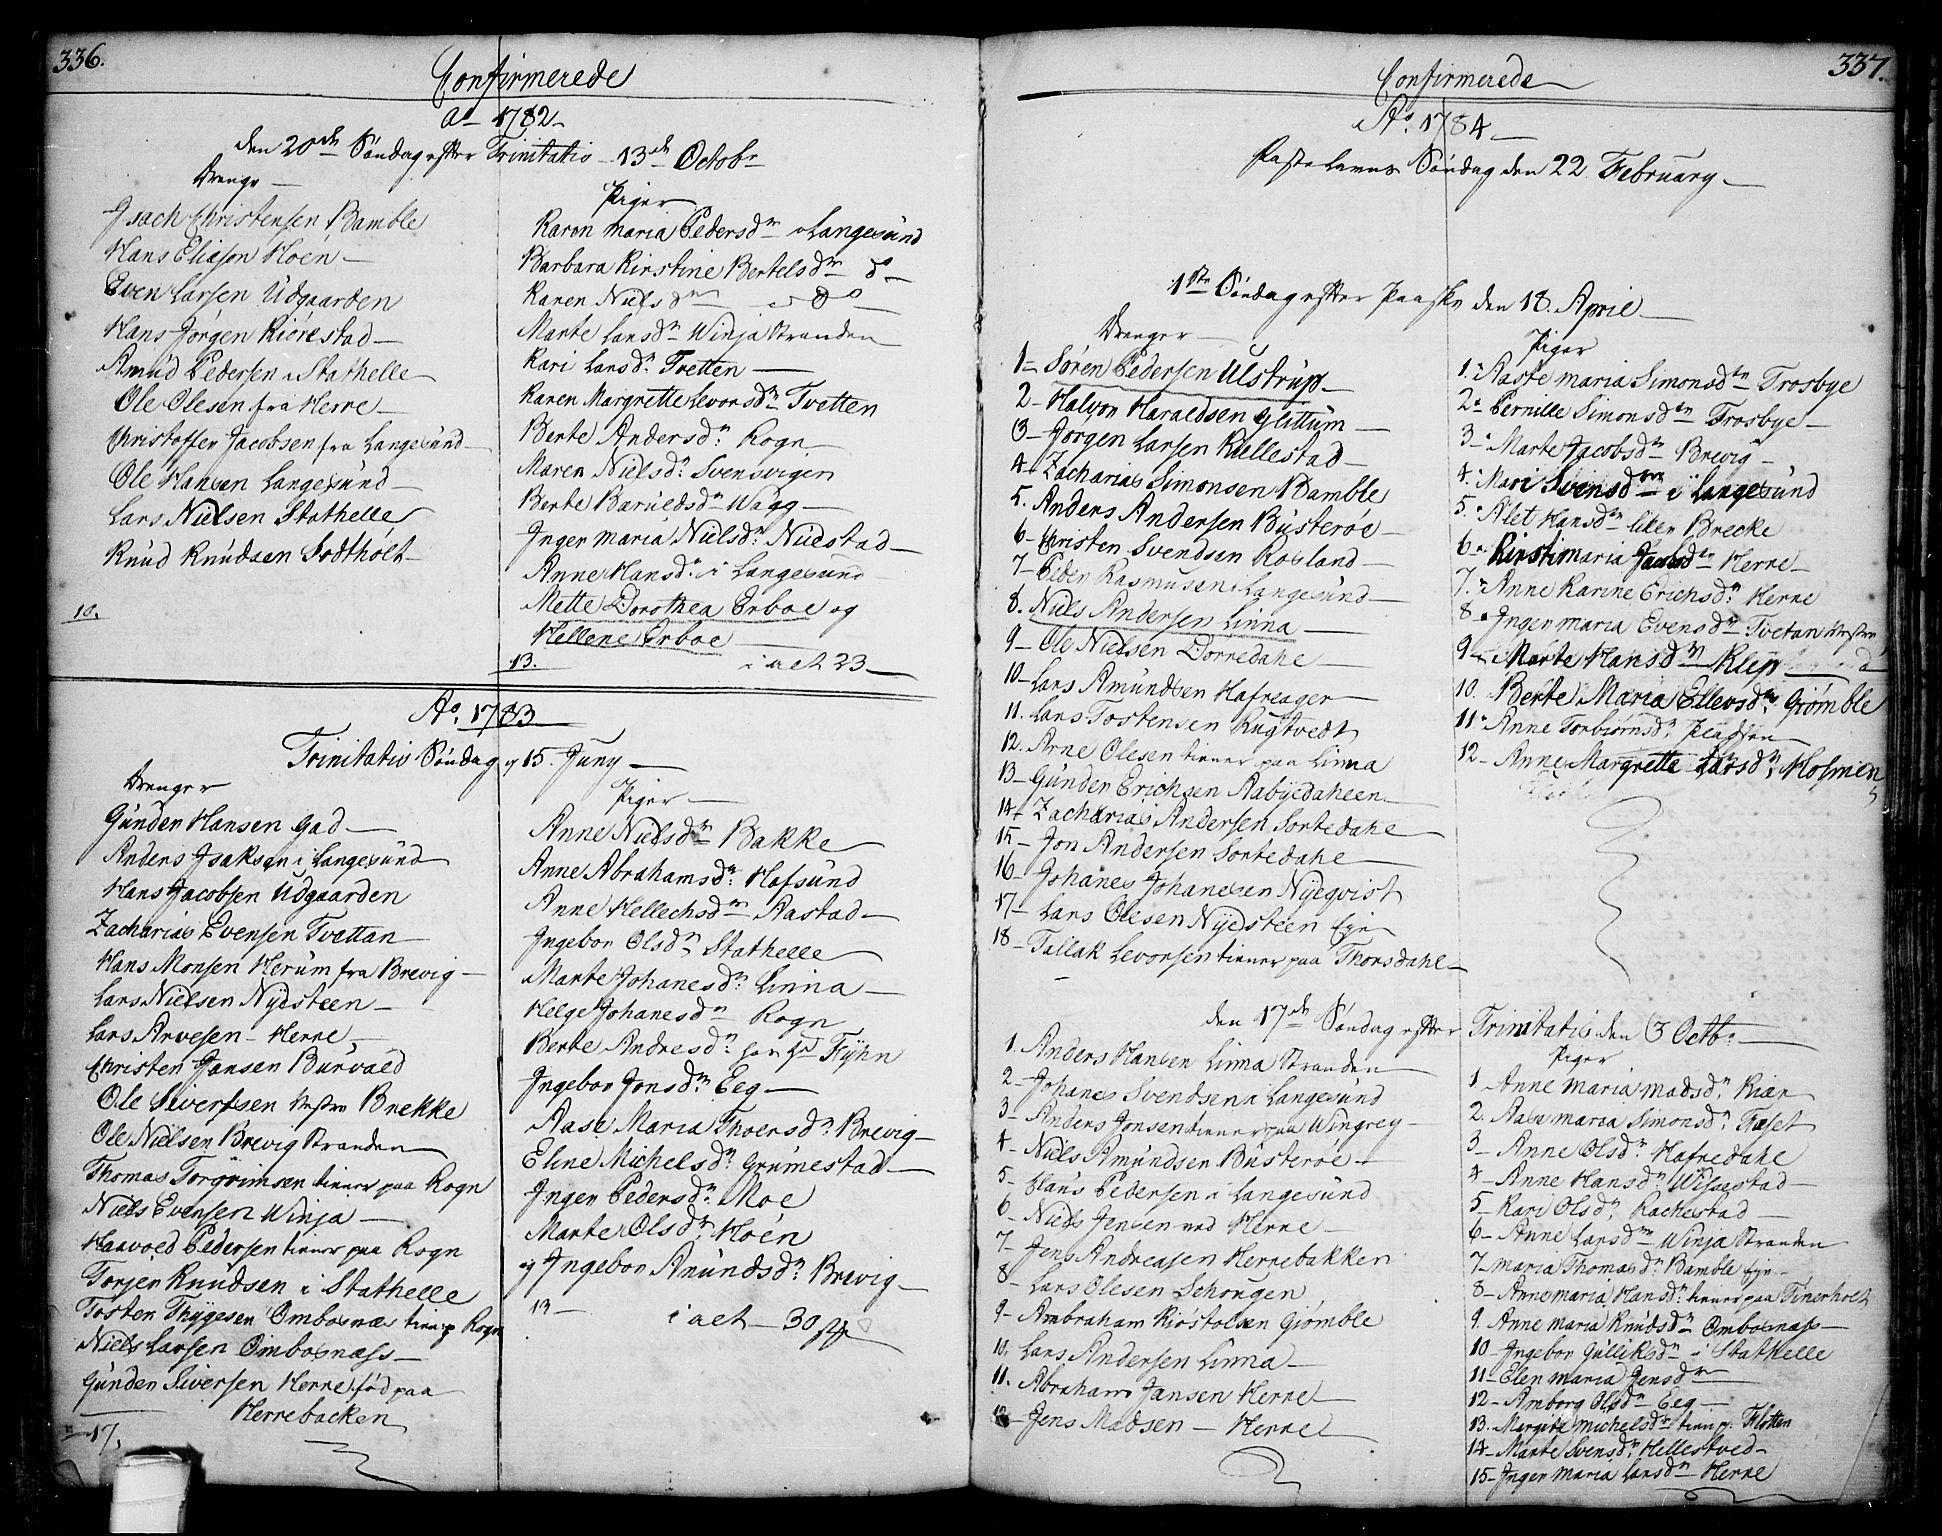 SAKO, Bamble kirkebøker, F/Fa/L0002: Ministerialbok nr. I 2, 1775-1814, s. 336-337